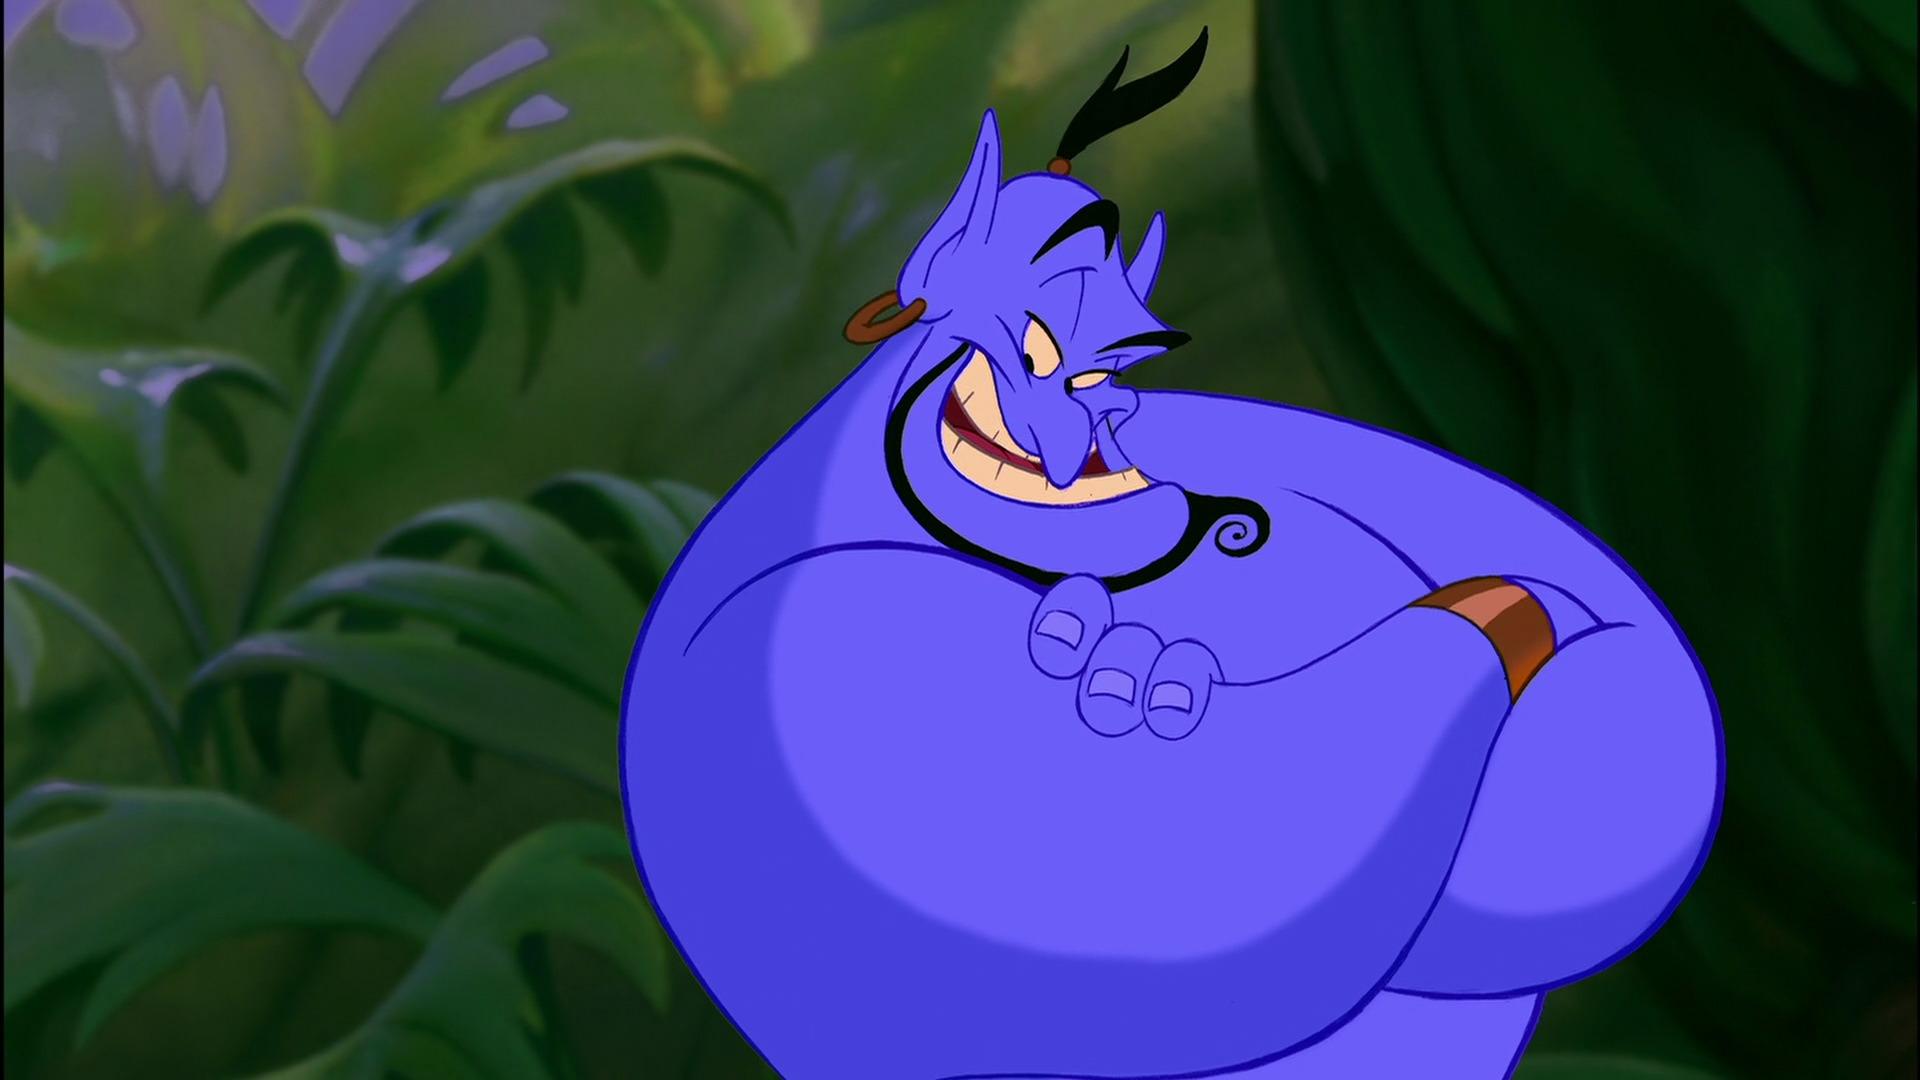 Disney Making Live-Action Aladdin Prequel Titled Genies